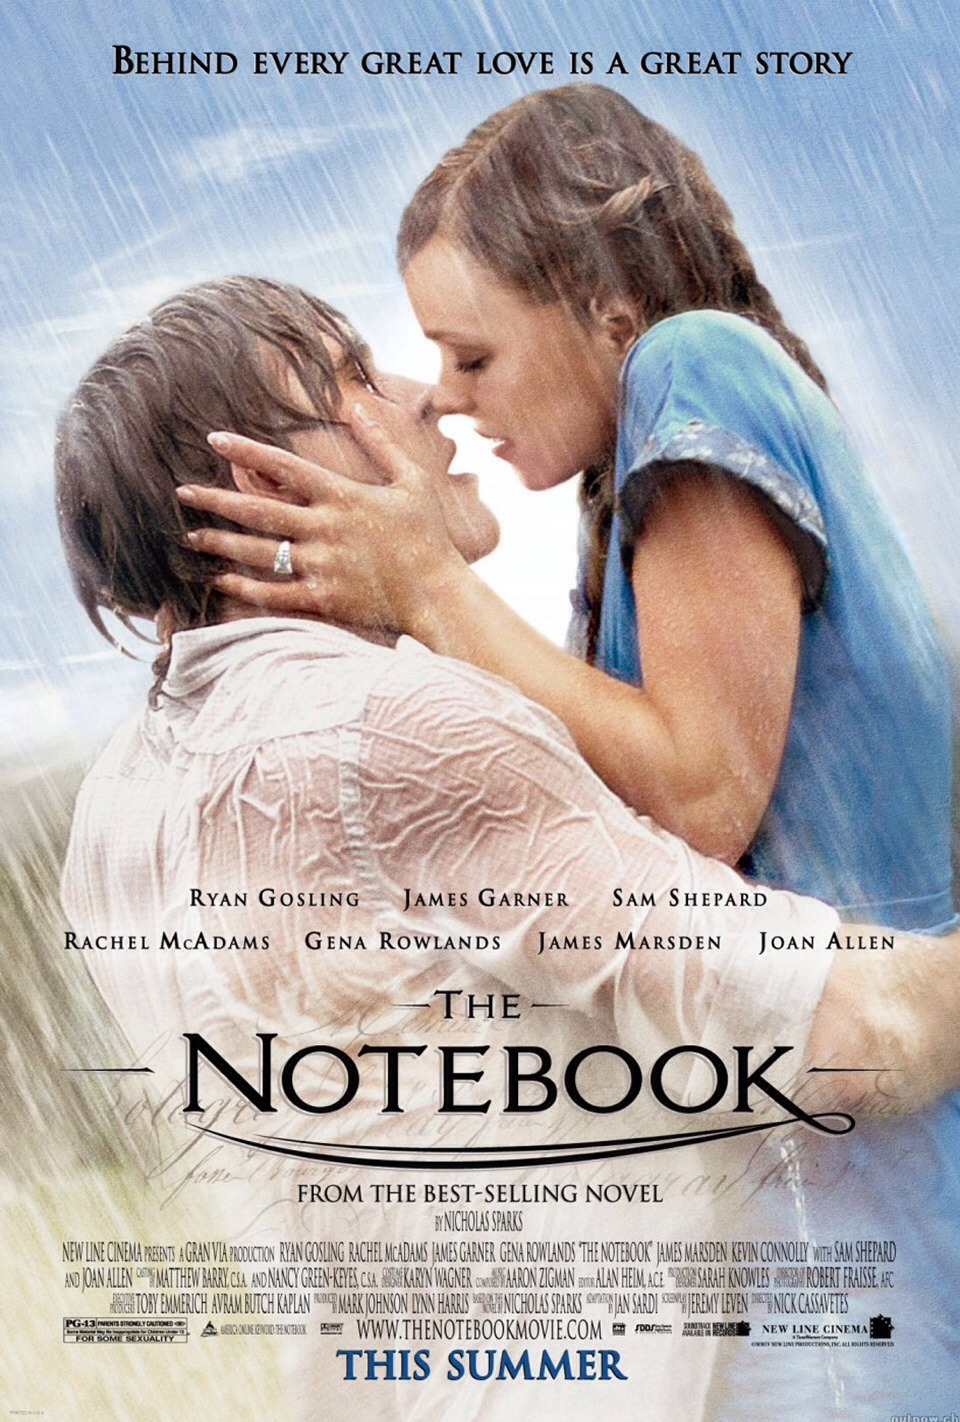 THE NOTEBOOK - romance